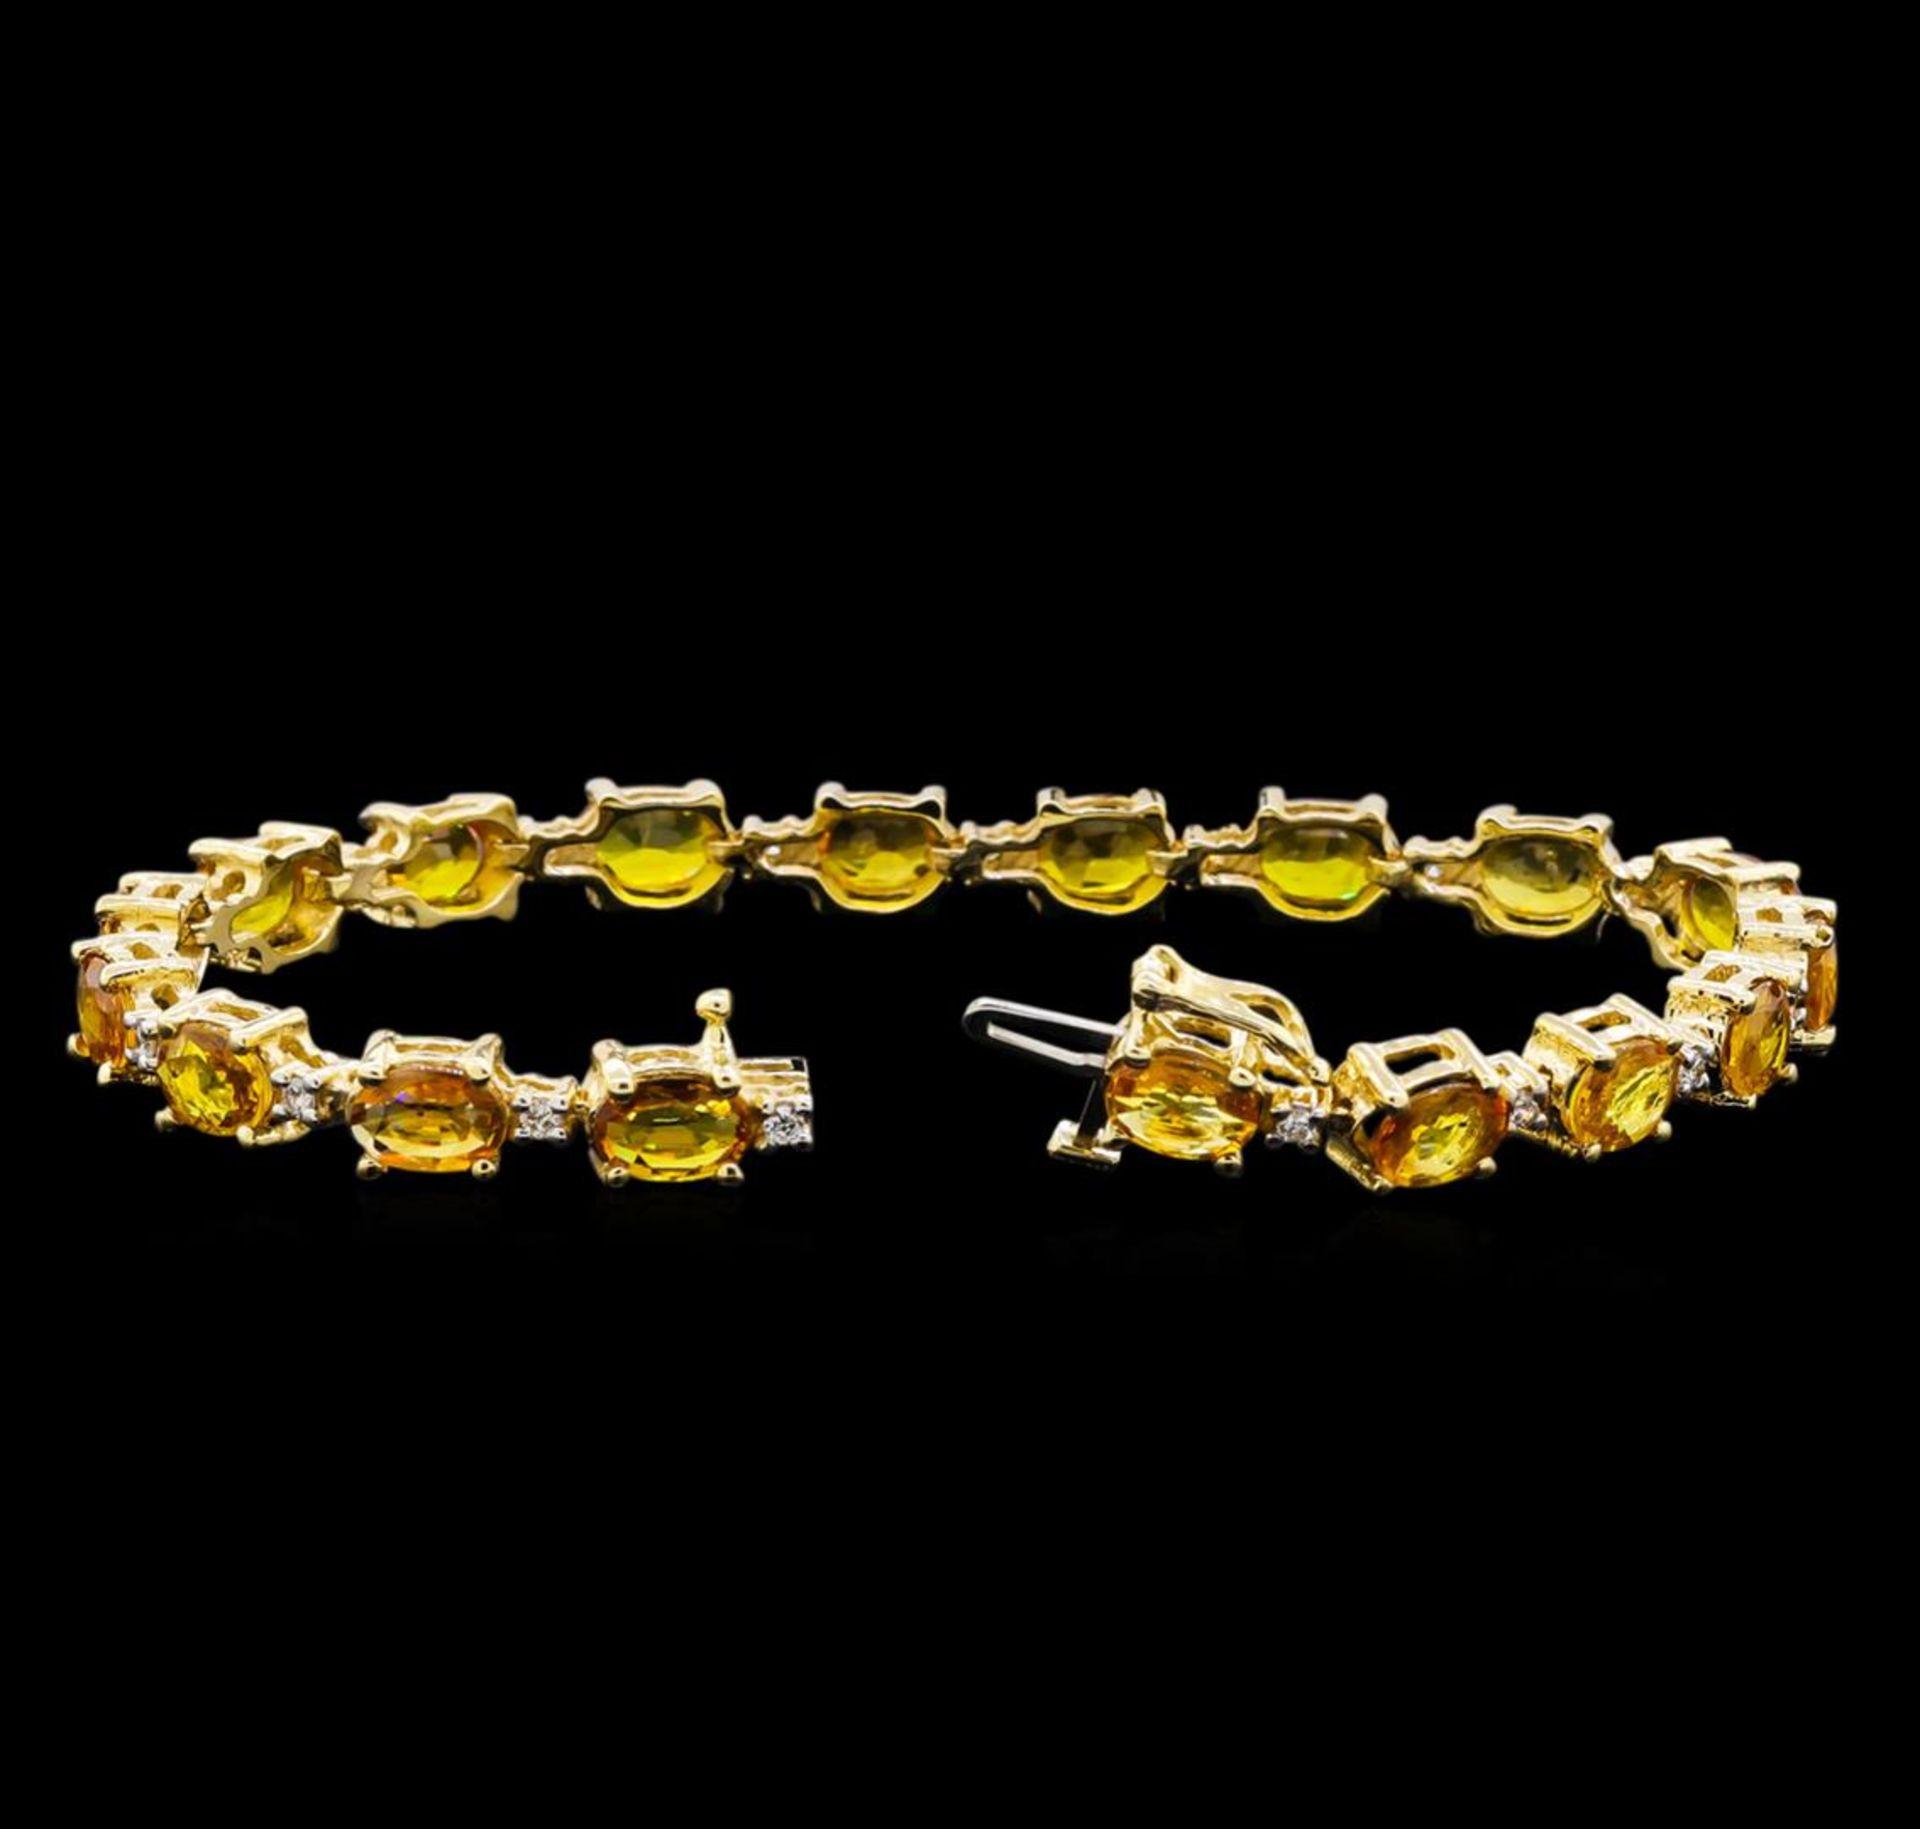 15.57 ctw Yellow Sapphire and Diamond Bracelet - 14KT Yellow Gold - Image 3 of 4